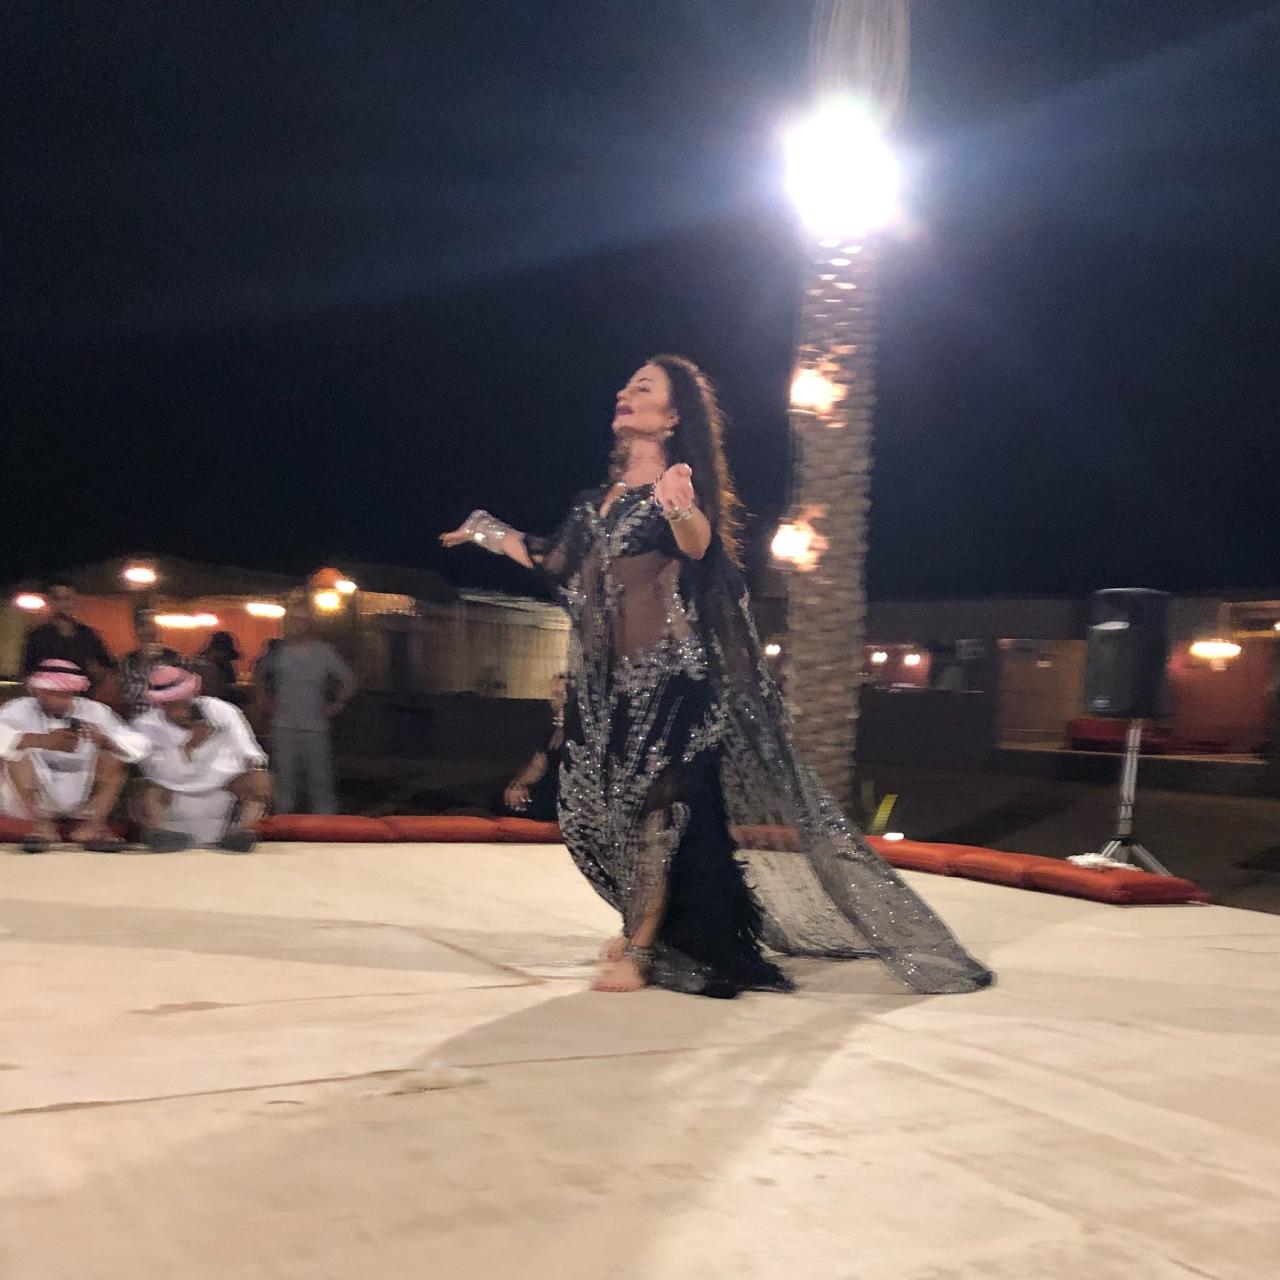 Belly dancing dubai desert